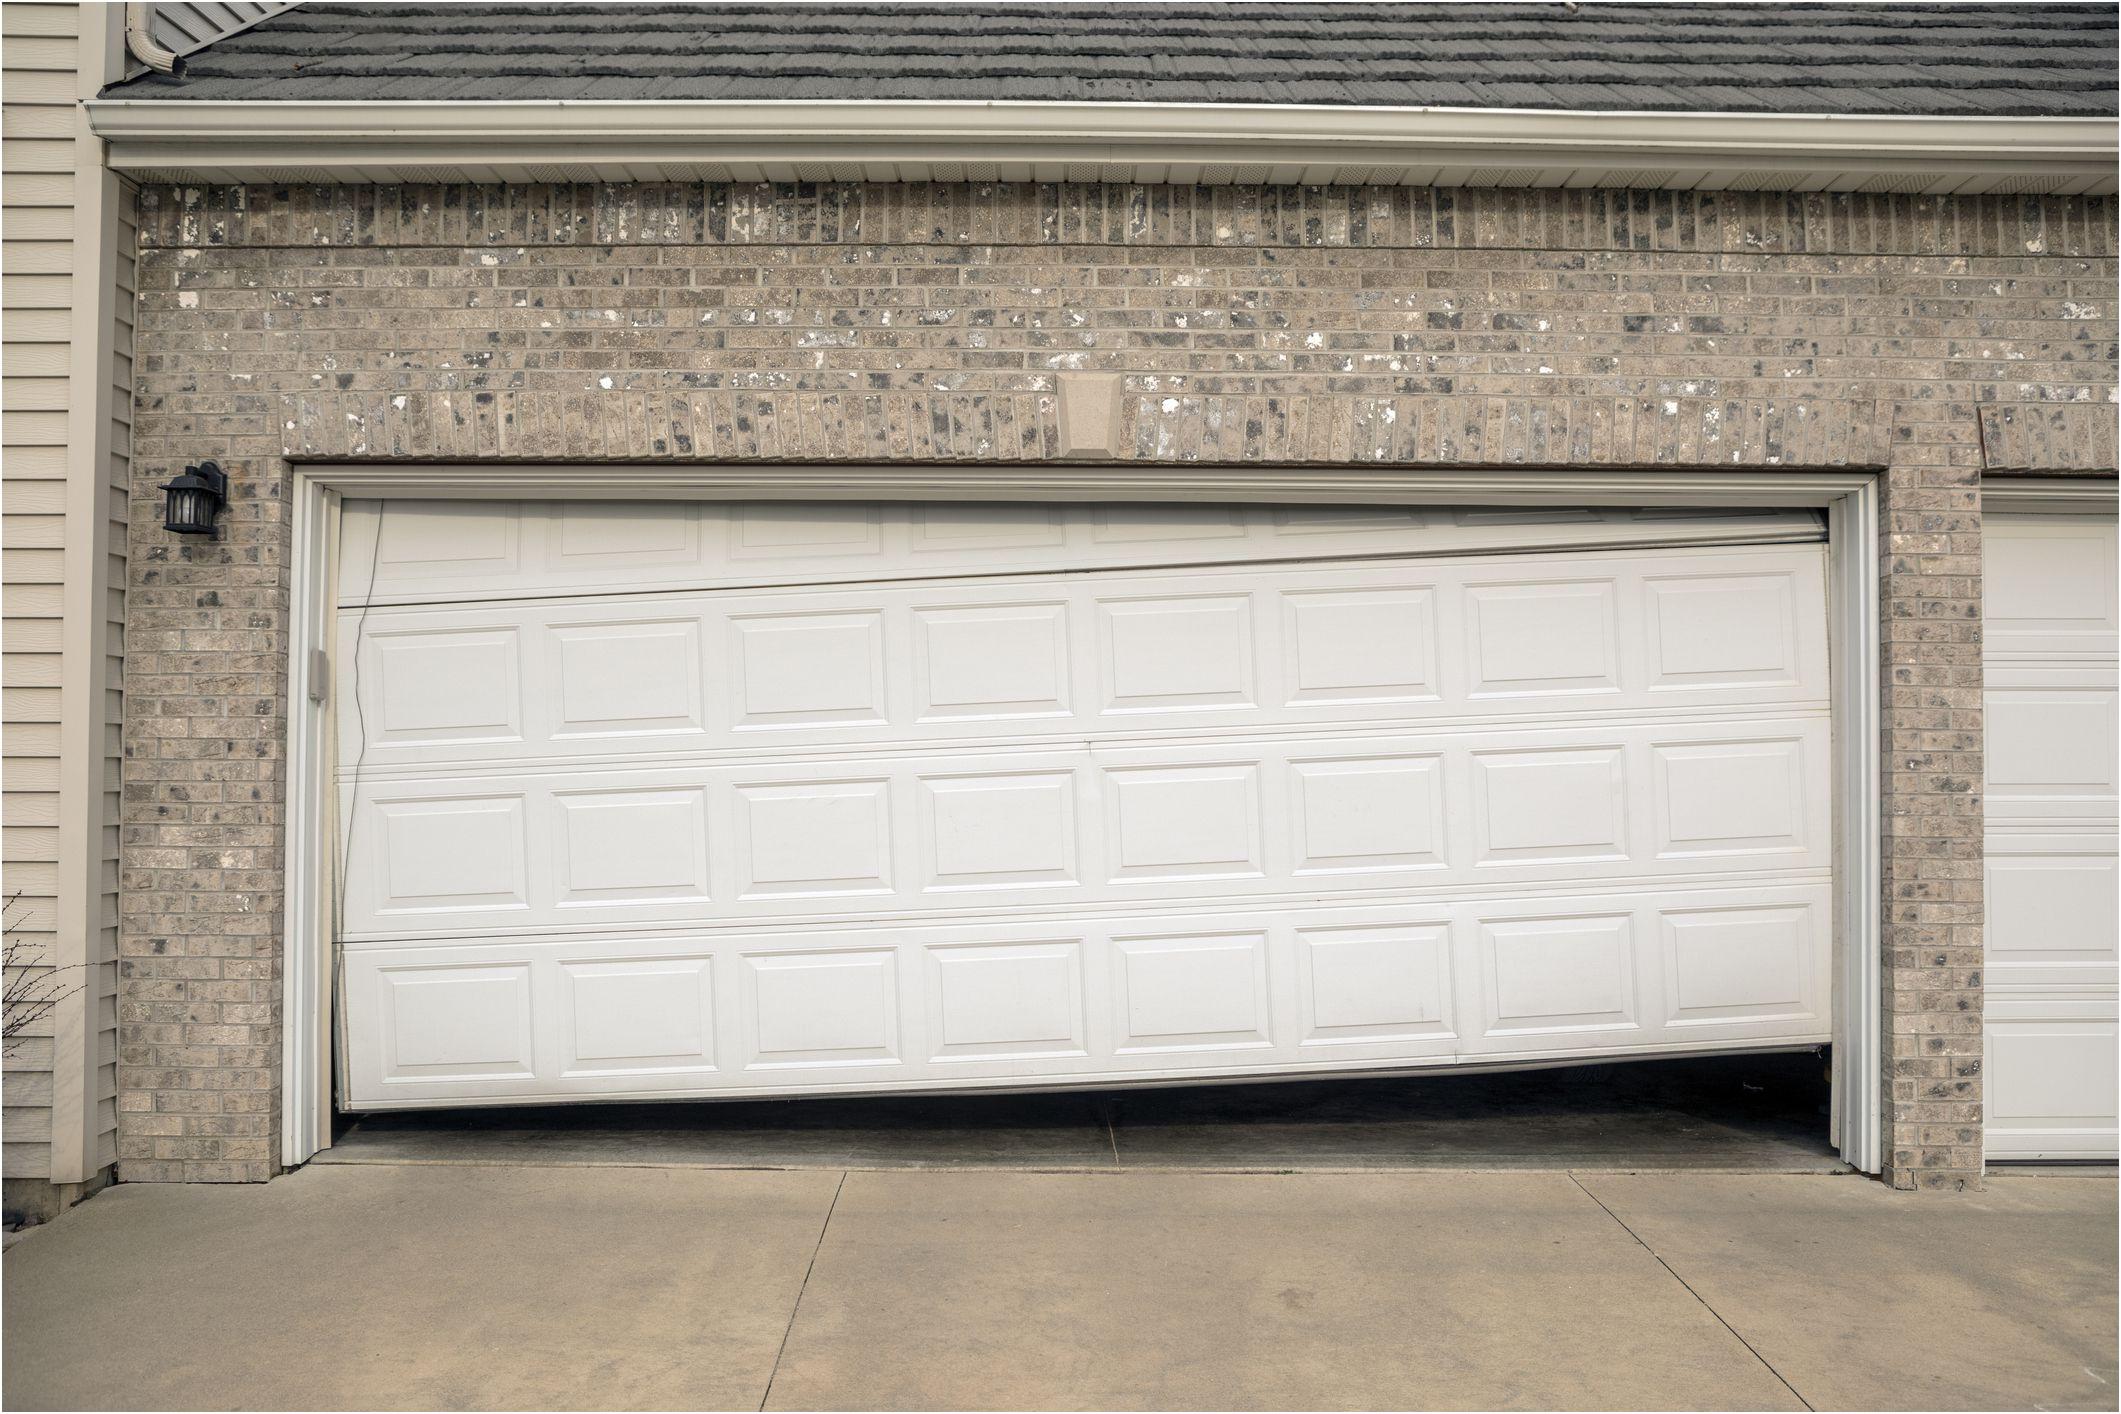 Lovely High Lift Garage Door Installation